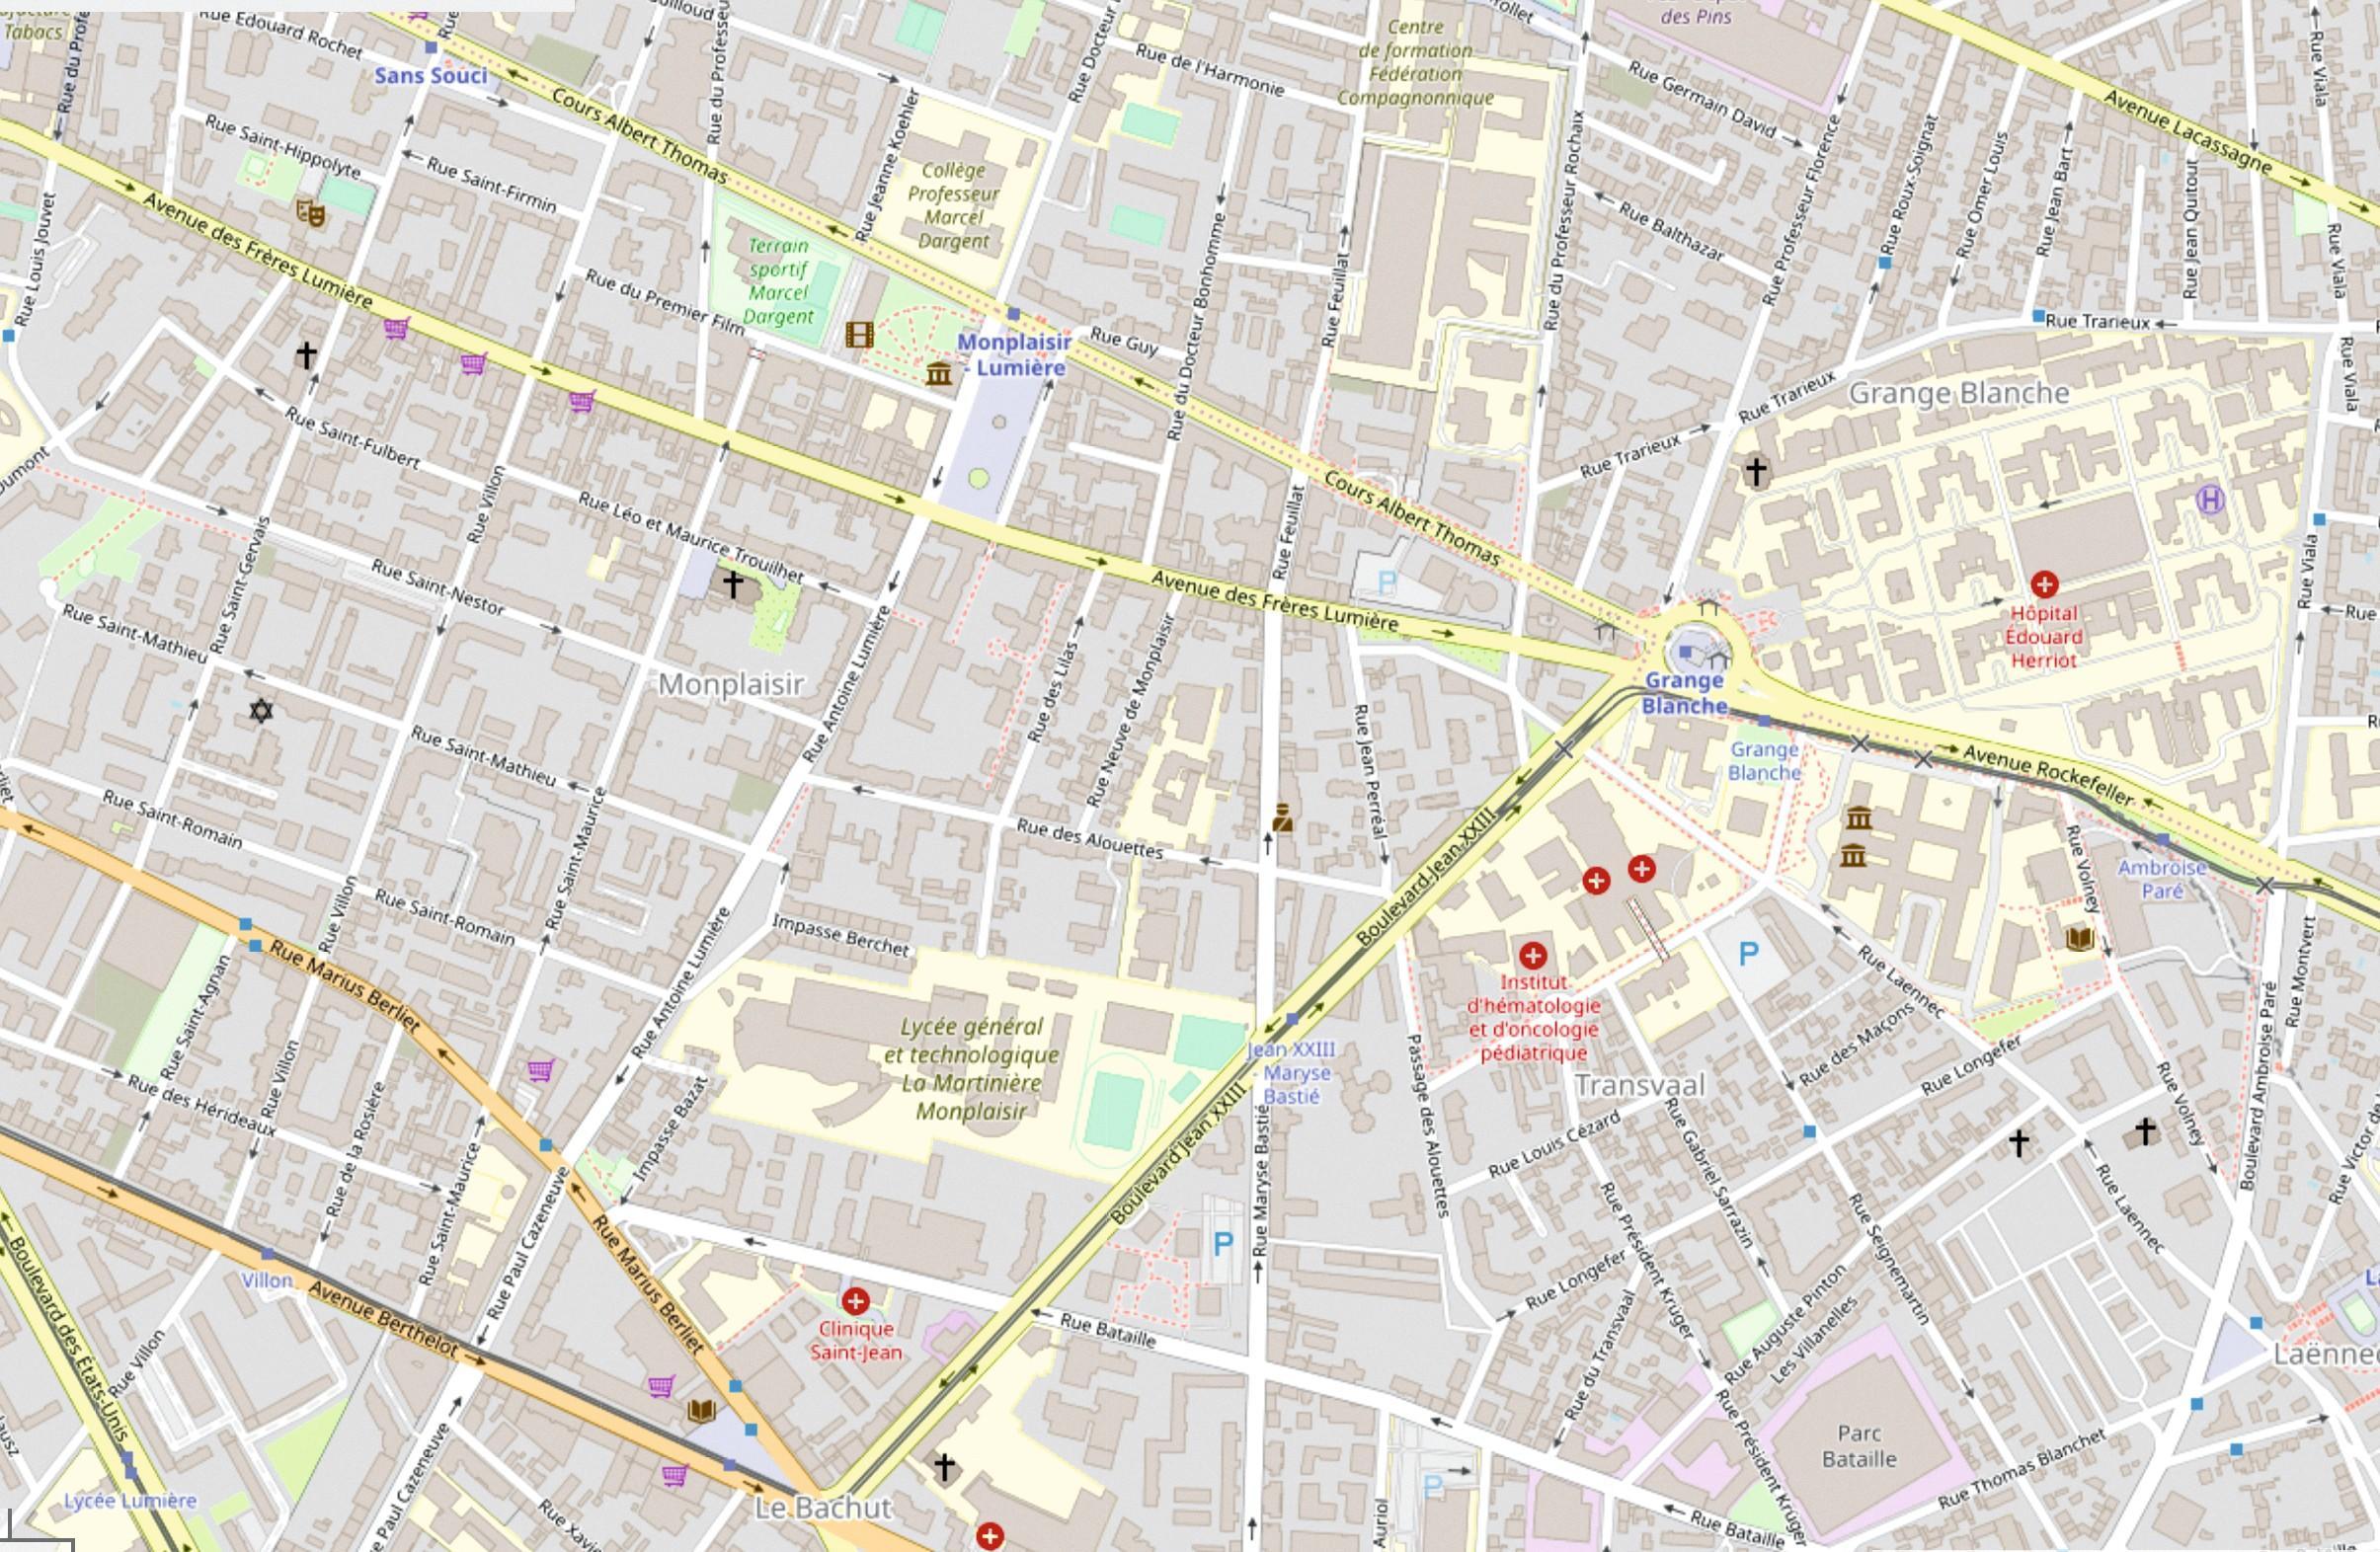 Quartier Lyon OpenStreetMap